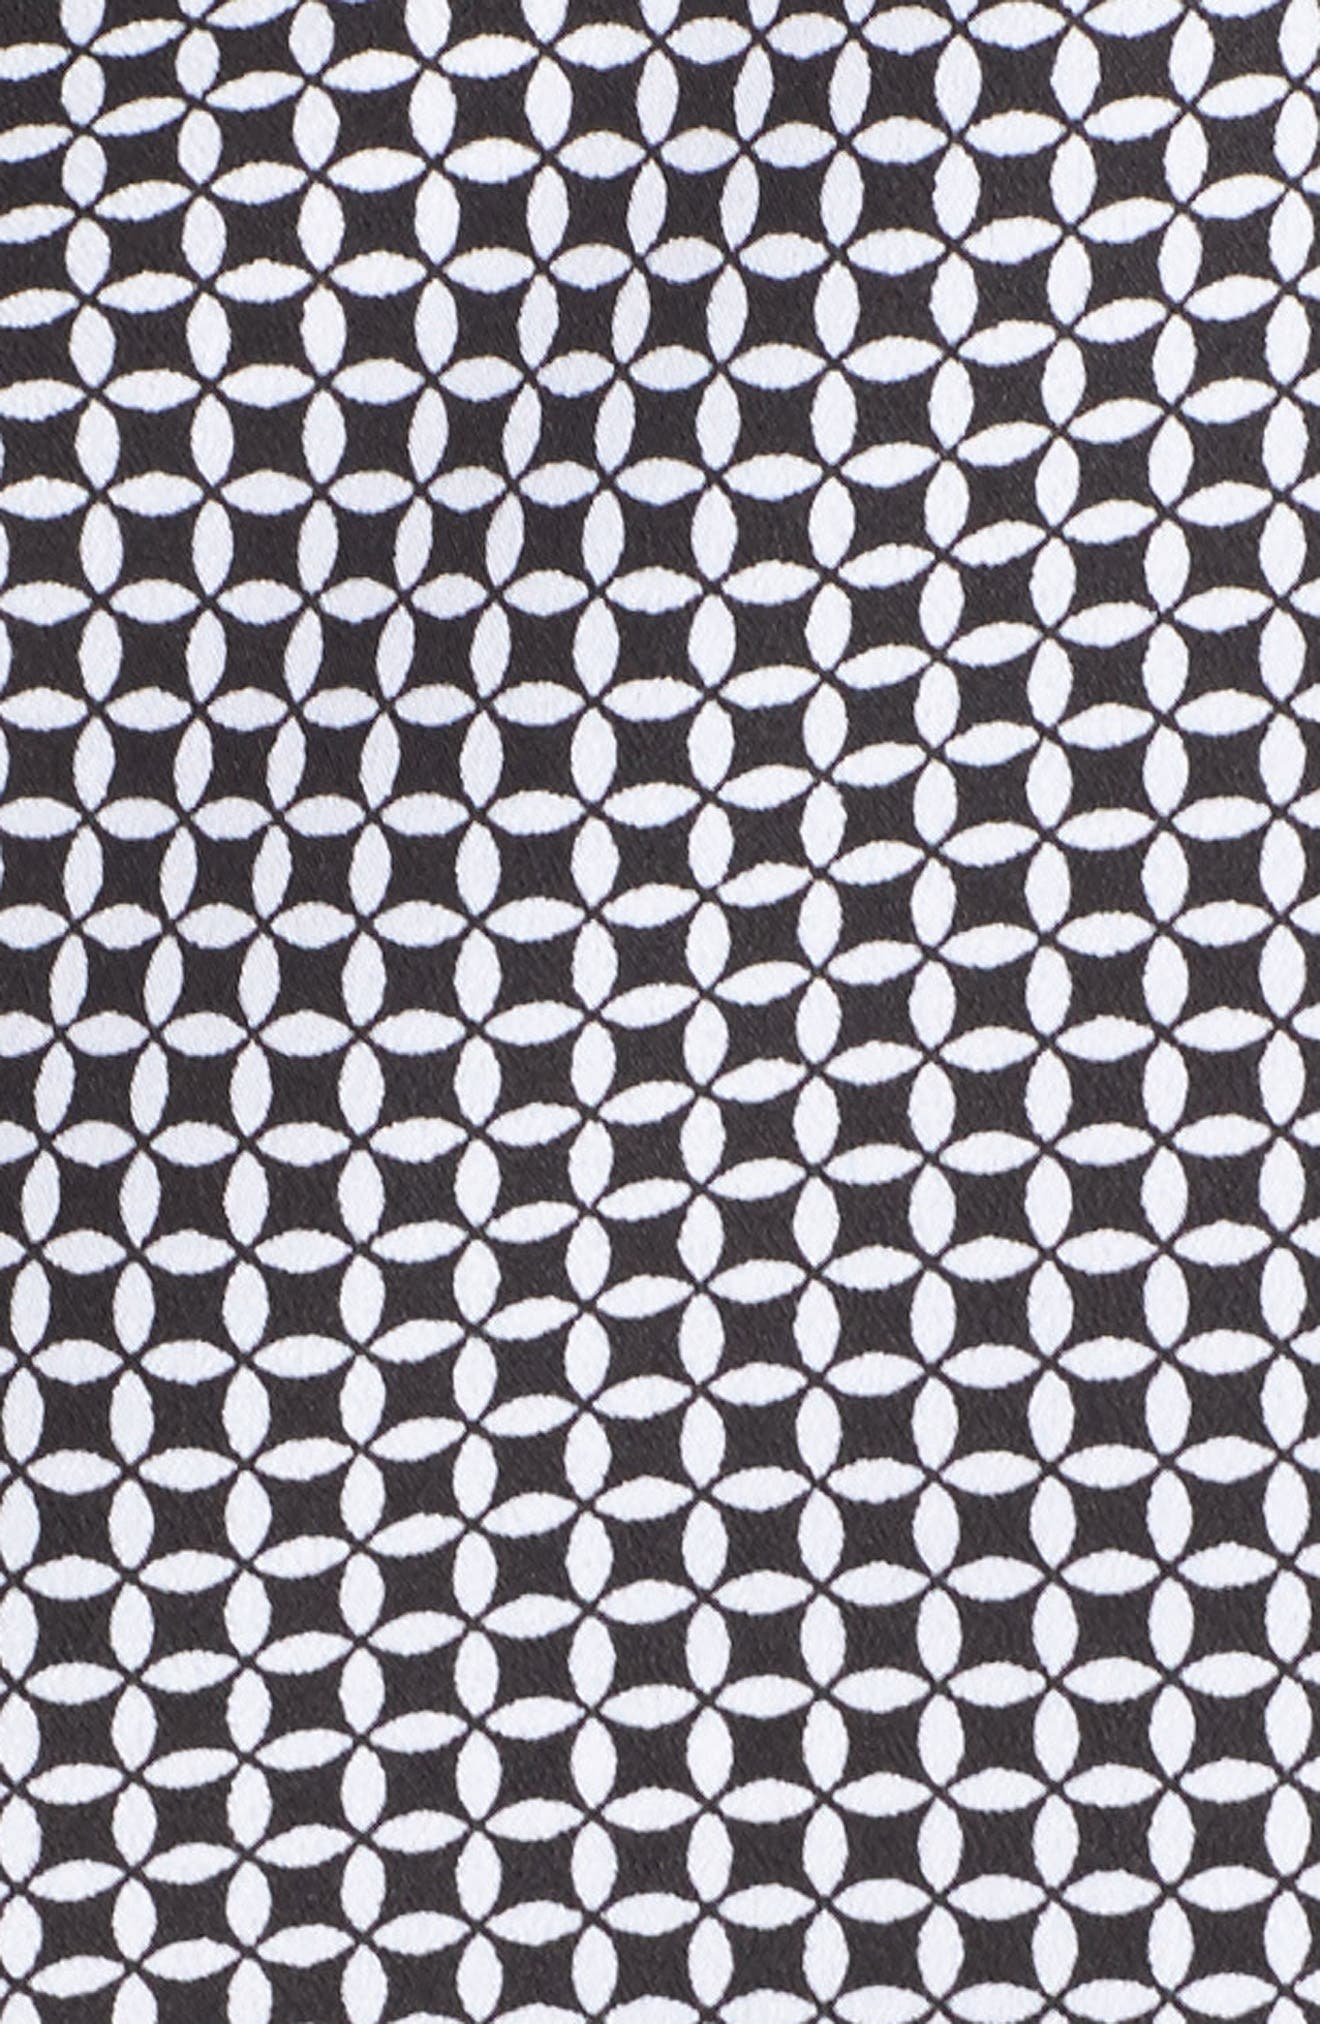 Geo Print Blouse,                             Alternate thumbnail 6, color,                             Black/ White